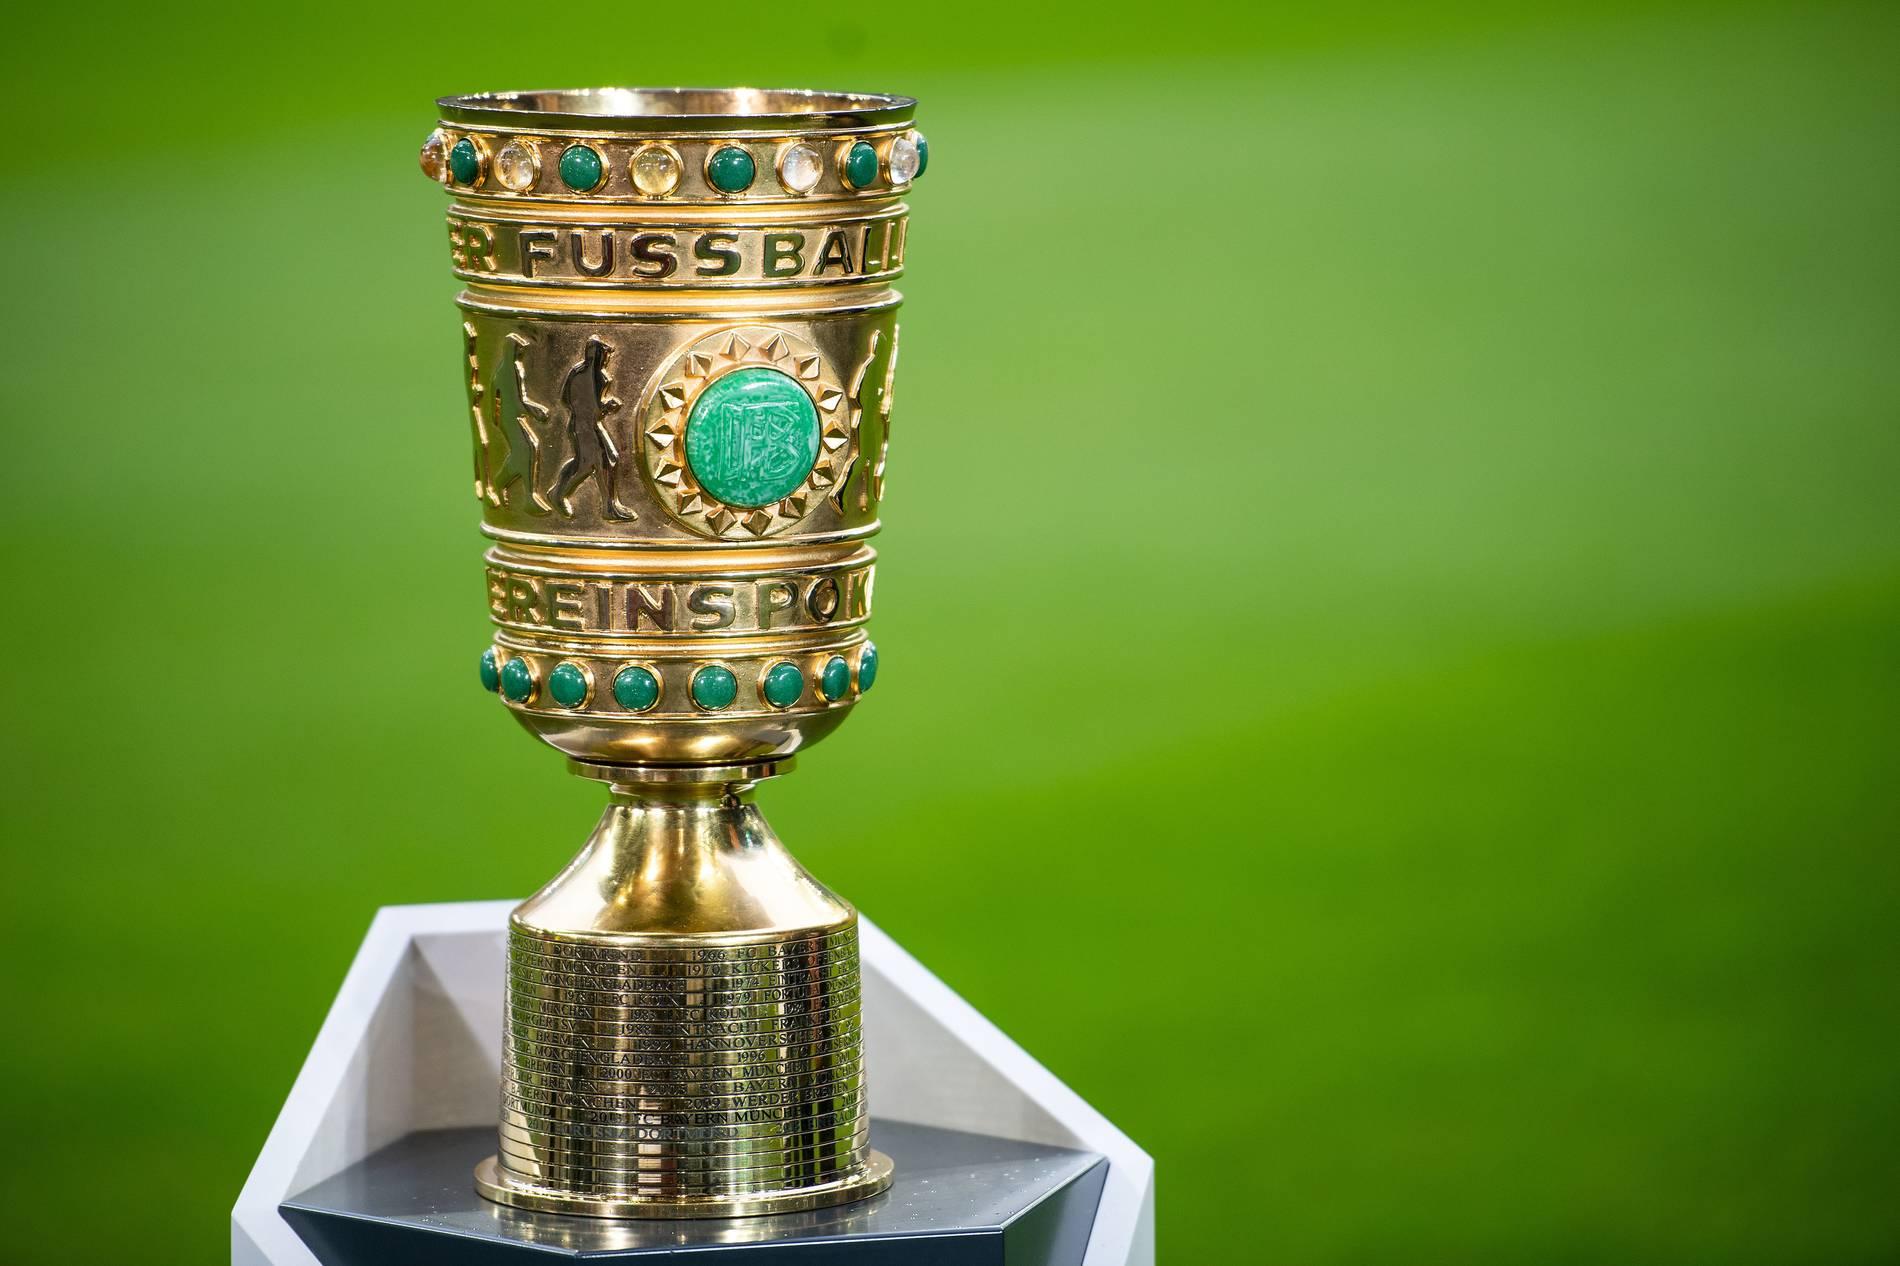 DFB-Pokal: Borussia Mönchengladbach live bei der ARD